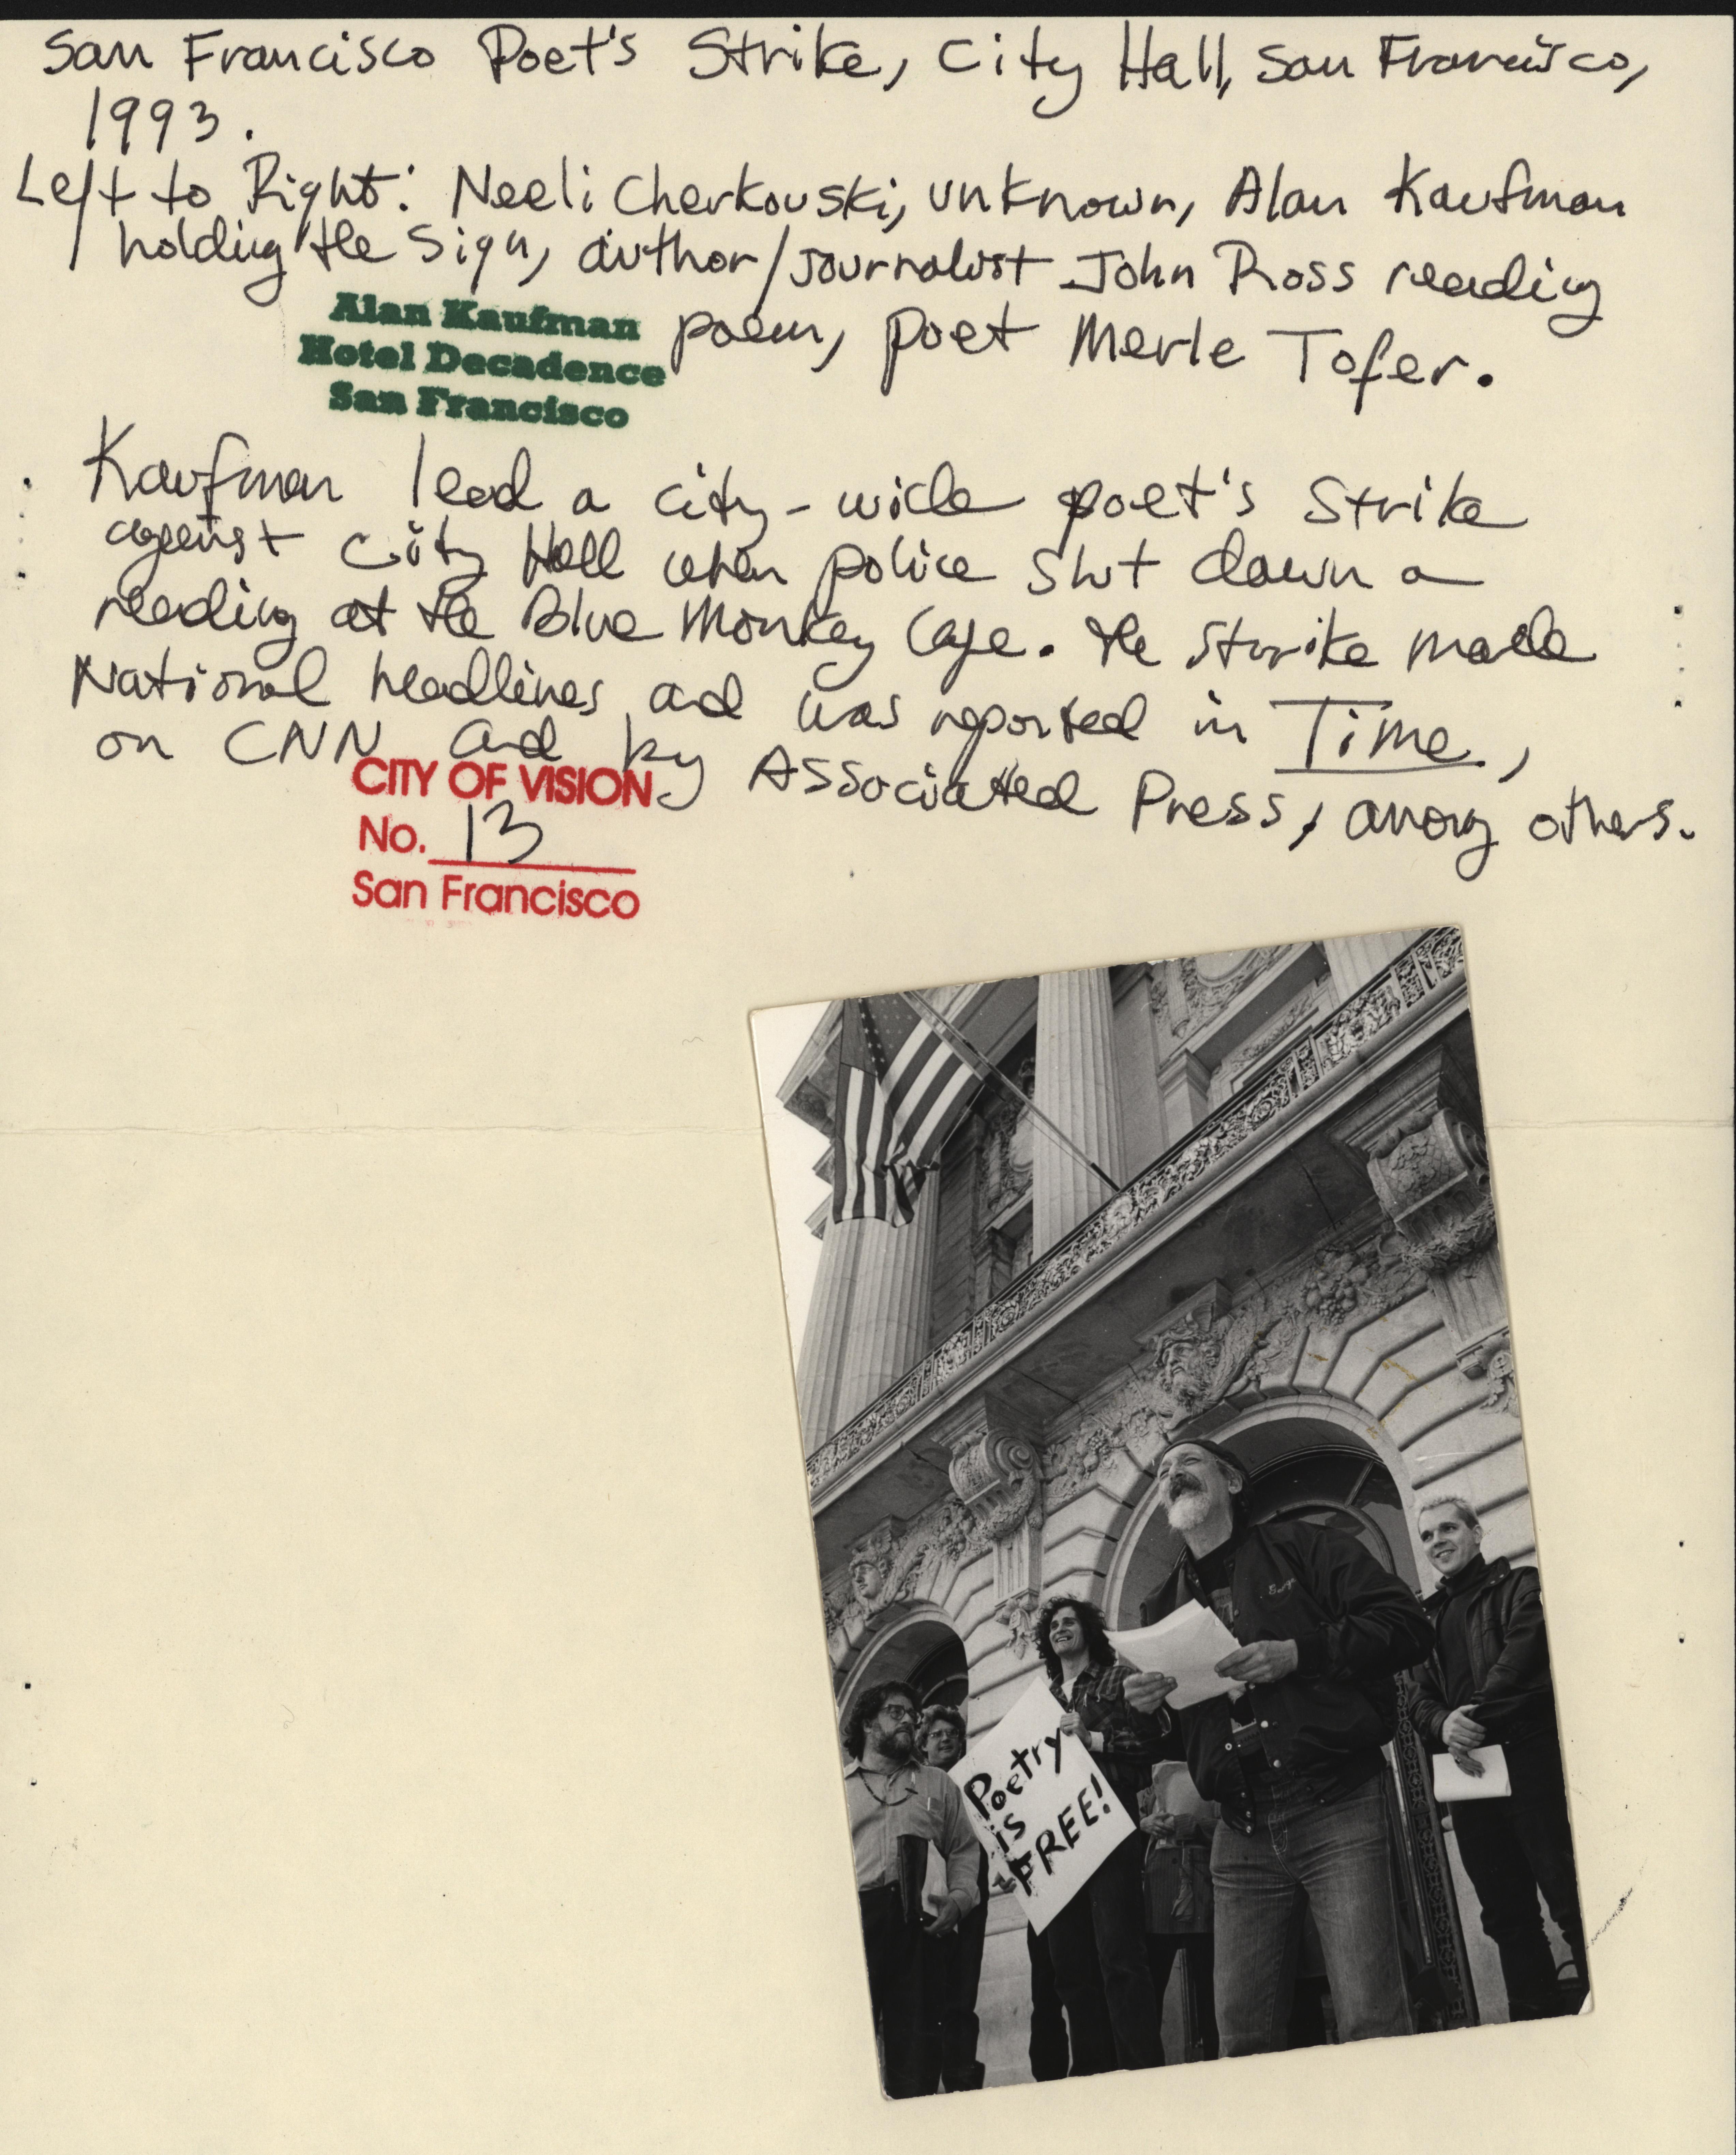 Alan Kaufman (holding sign) at San Francisco Poet's Strike, City Hall, San Francisco, 1993. City of Vision no. 13. Alan Kaufman Hotel Decadence, San Francisco.